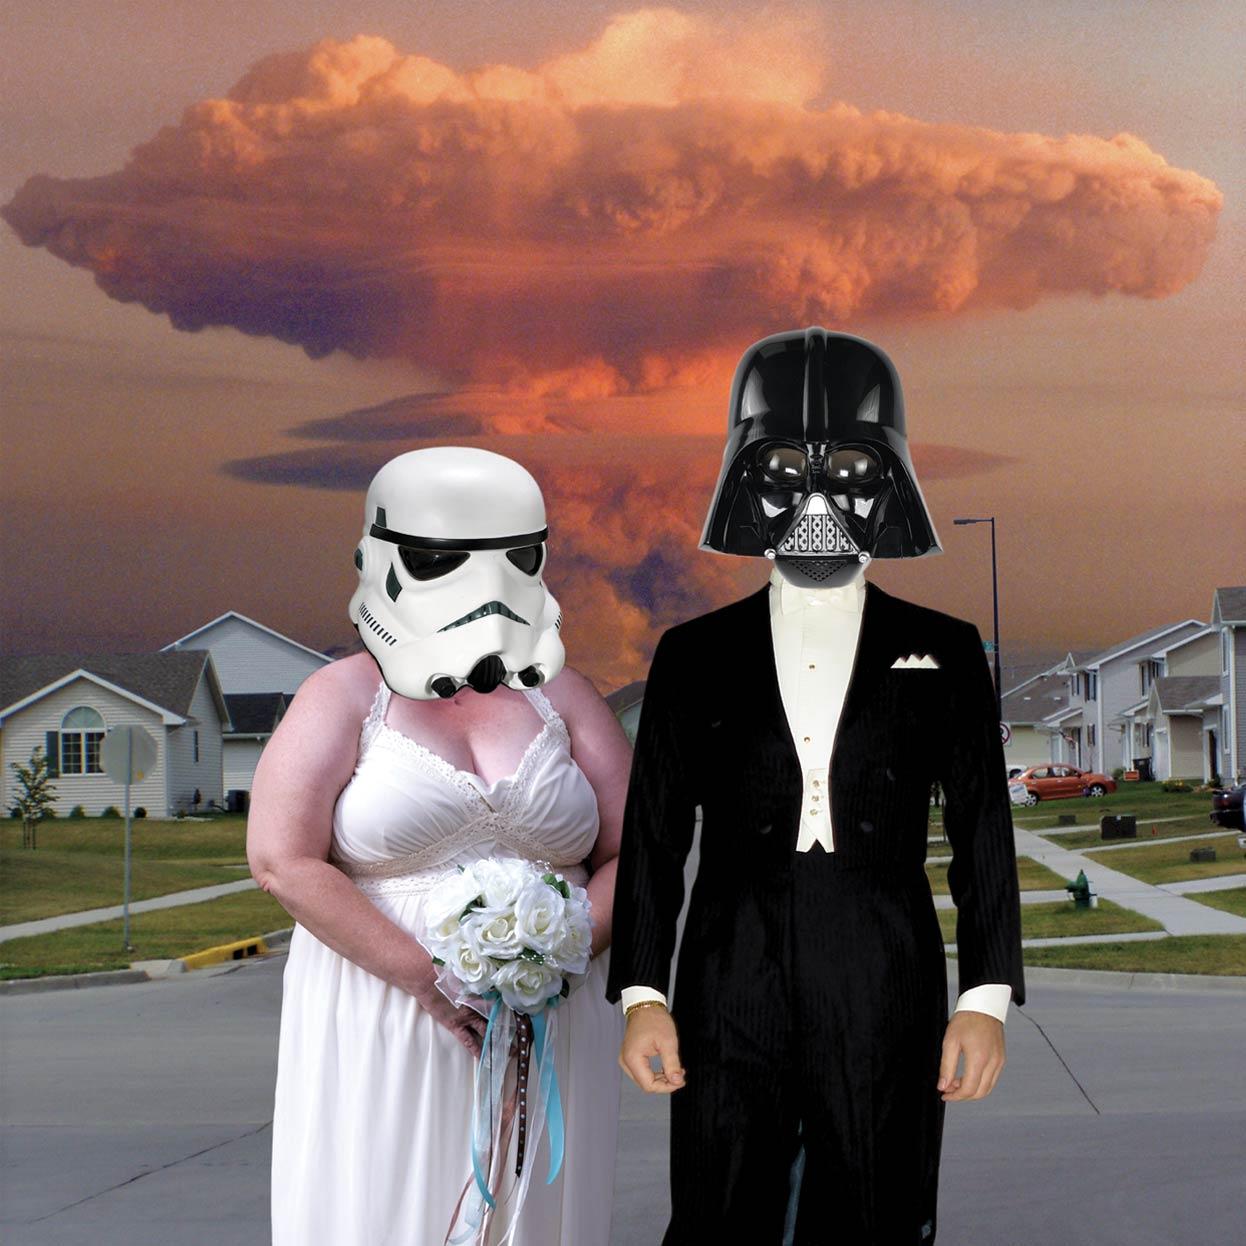 American Wedding N. 2 - Max Papeschi